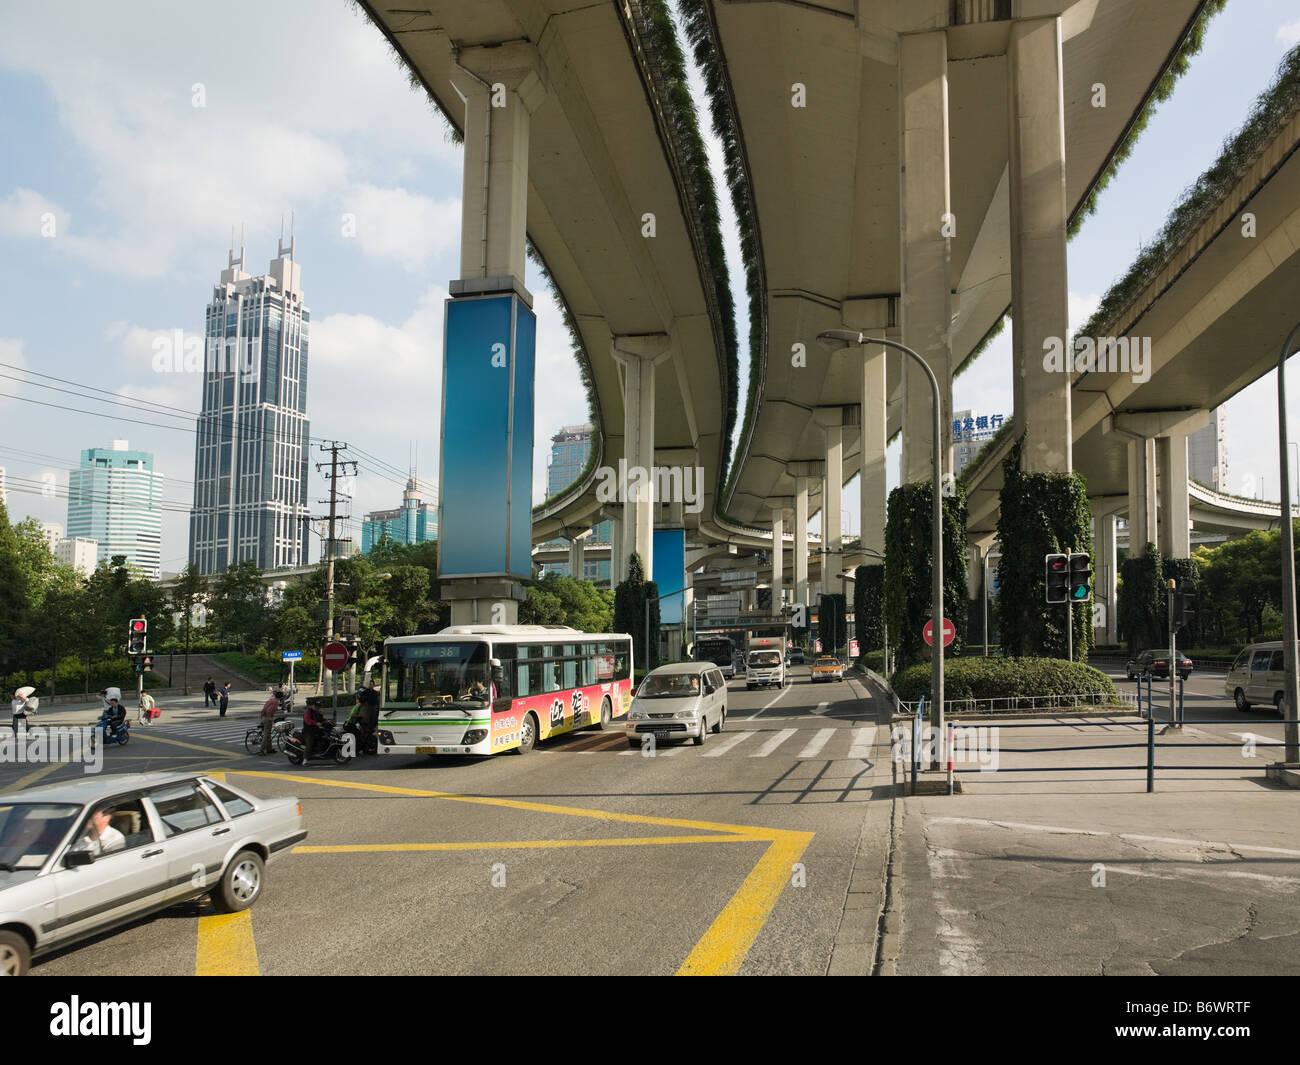 Road in shanghai - Stock Image